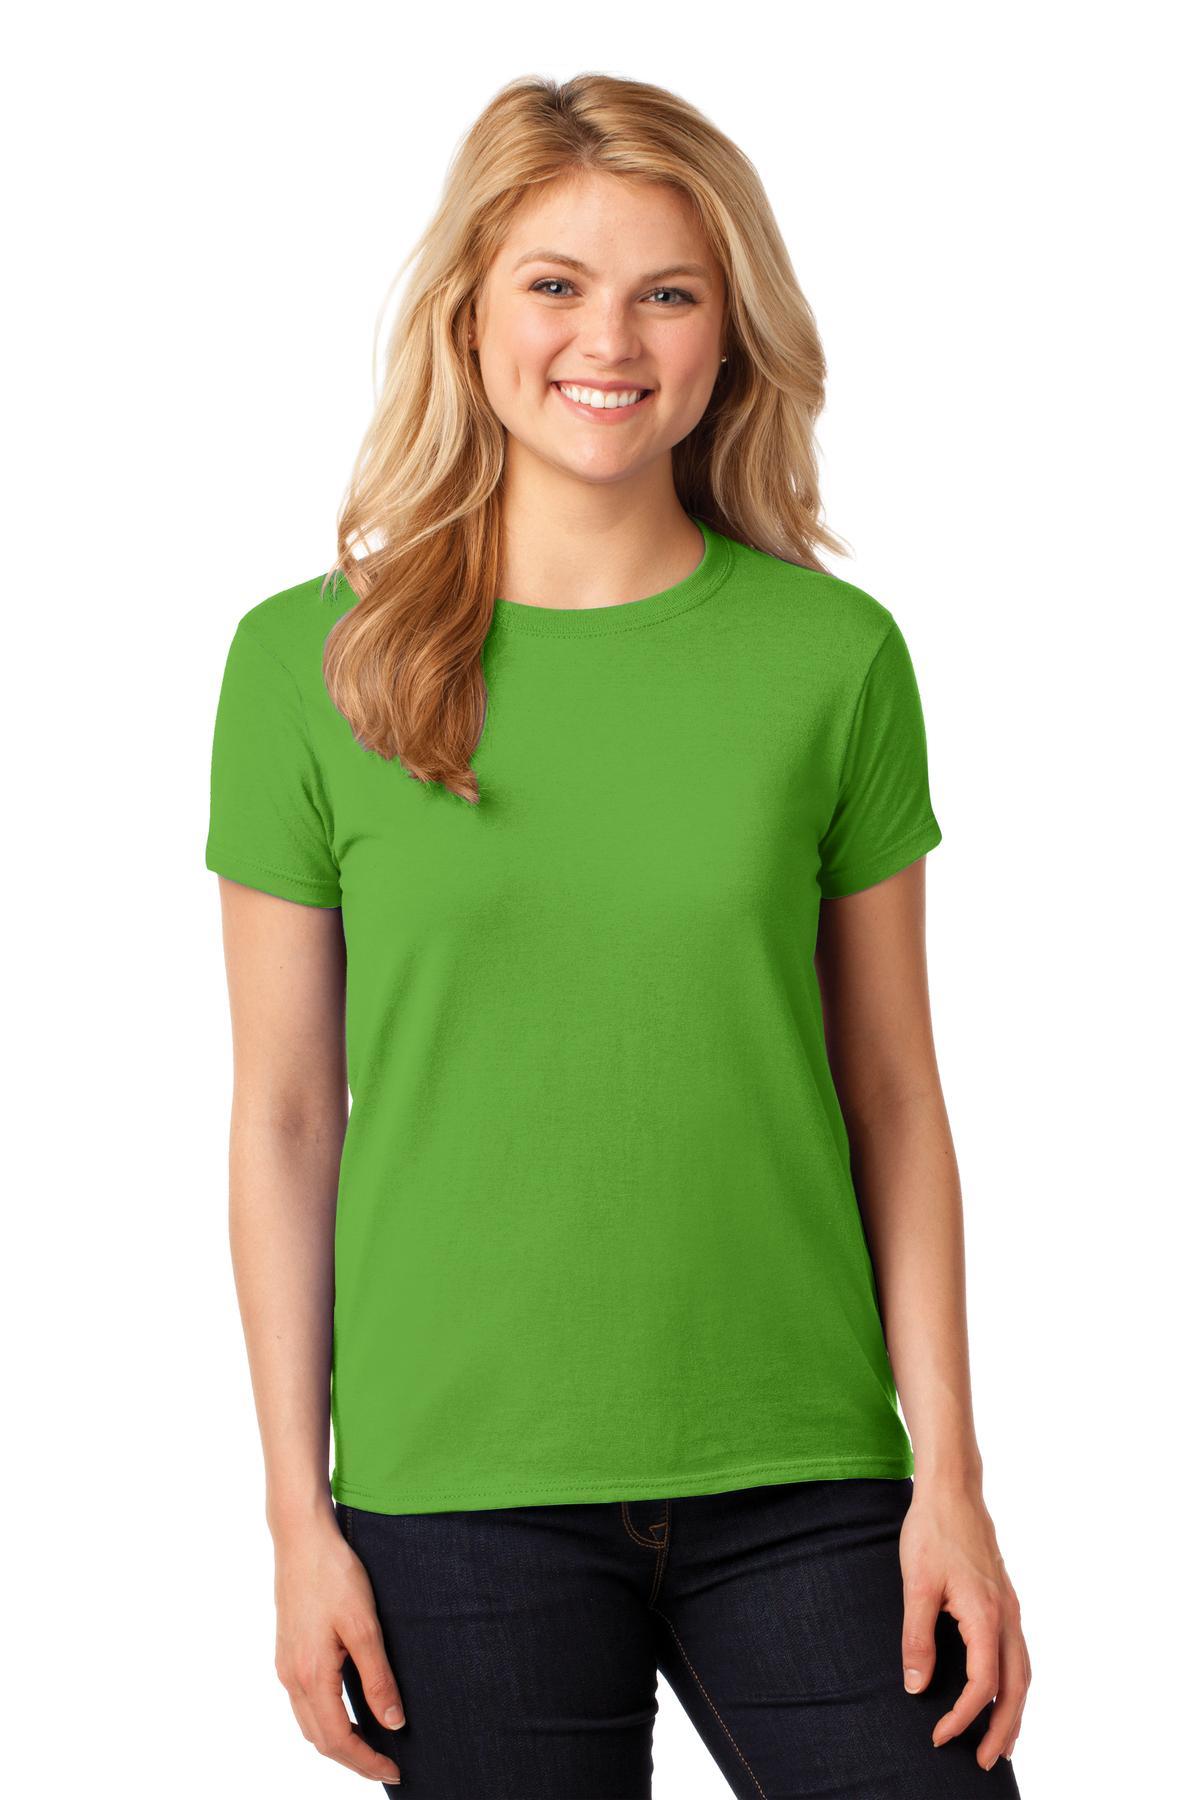 T-Shirts-100-Cotton-22